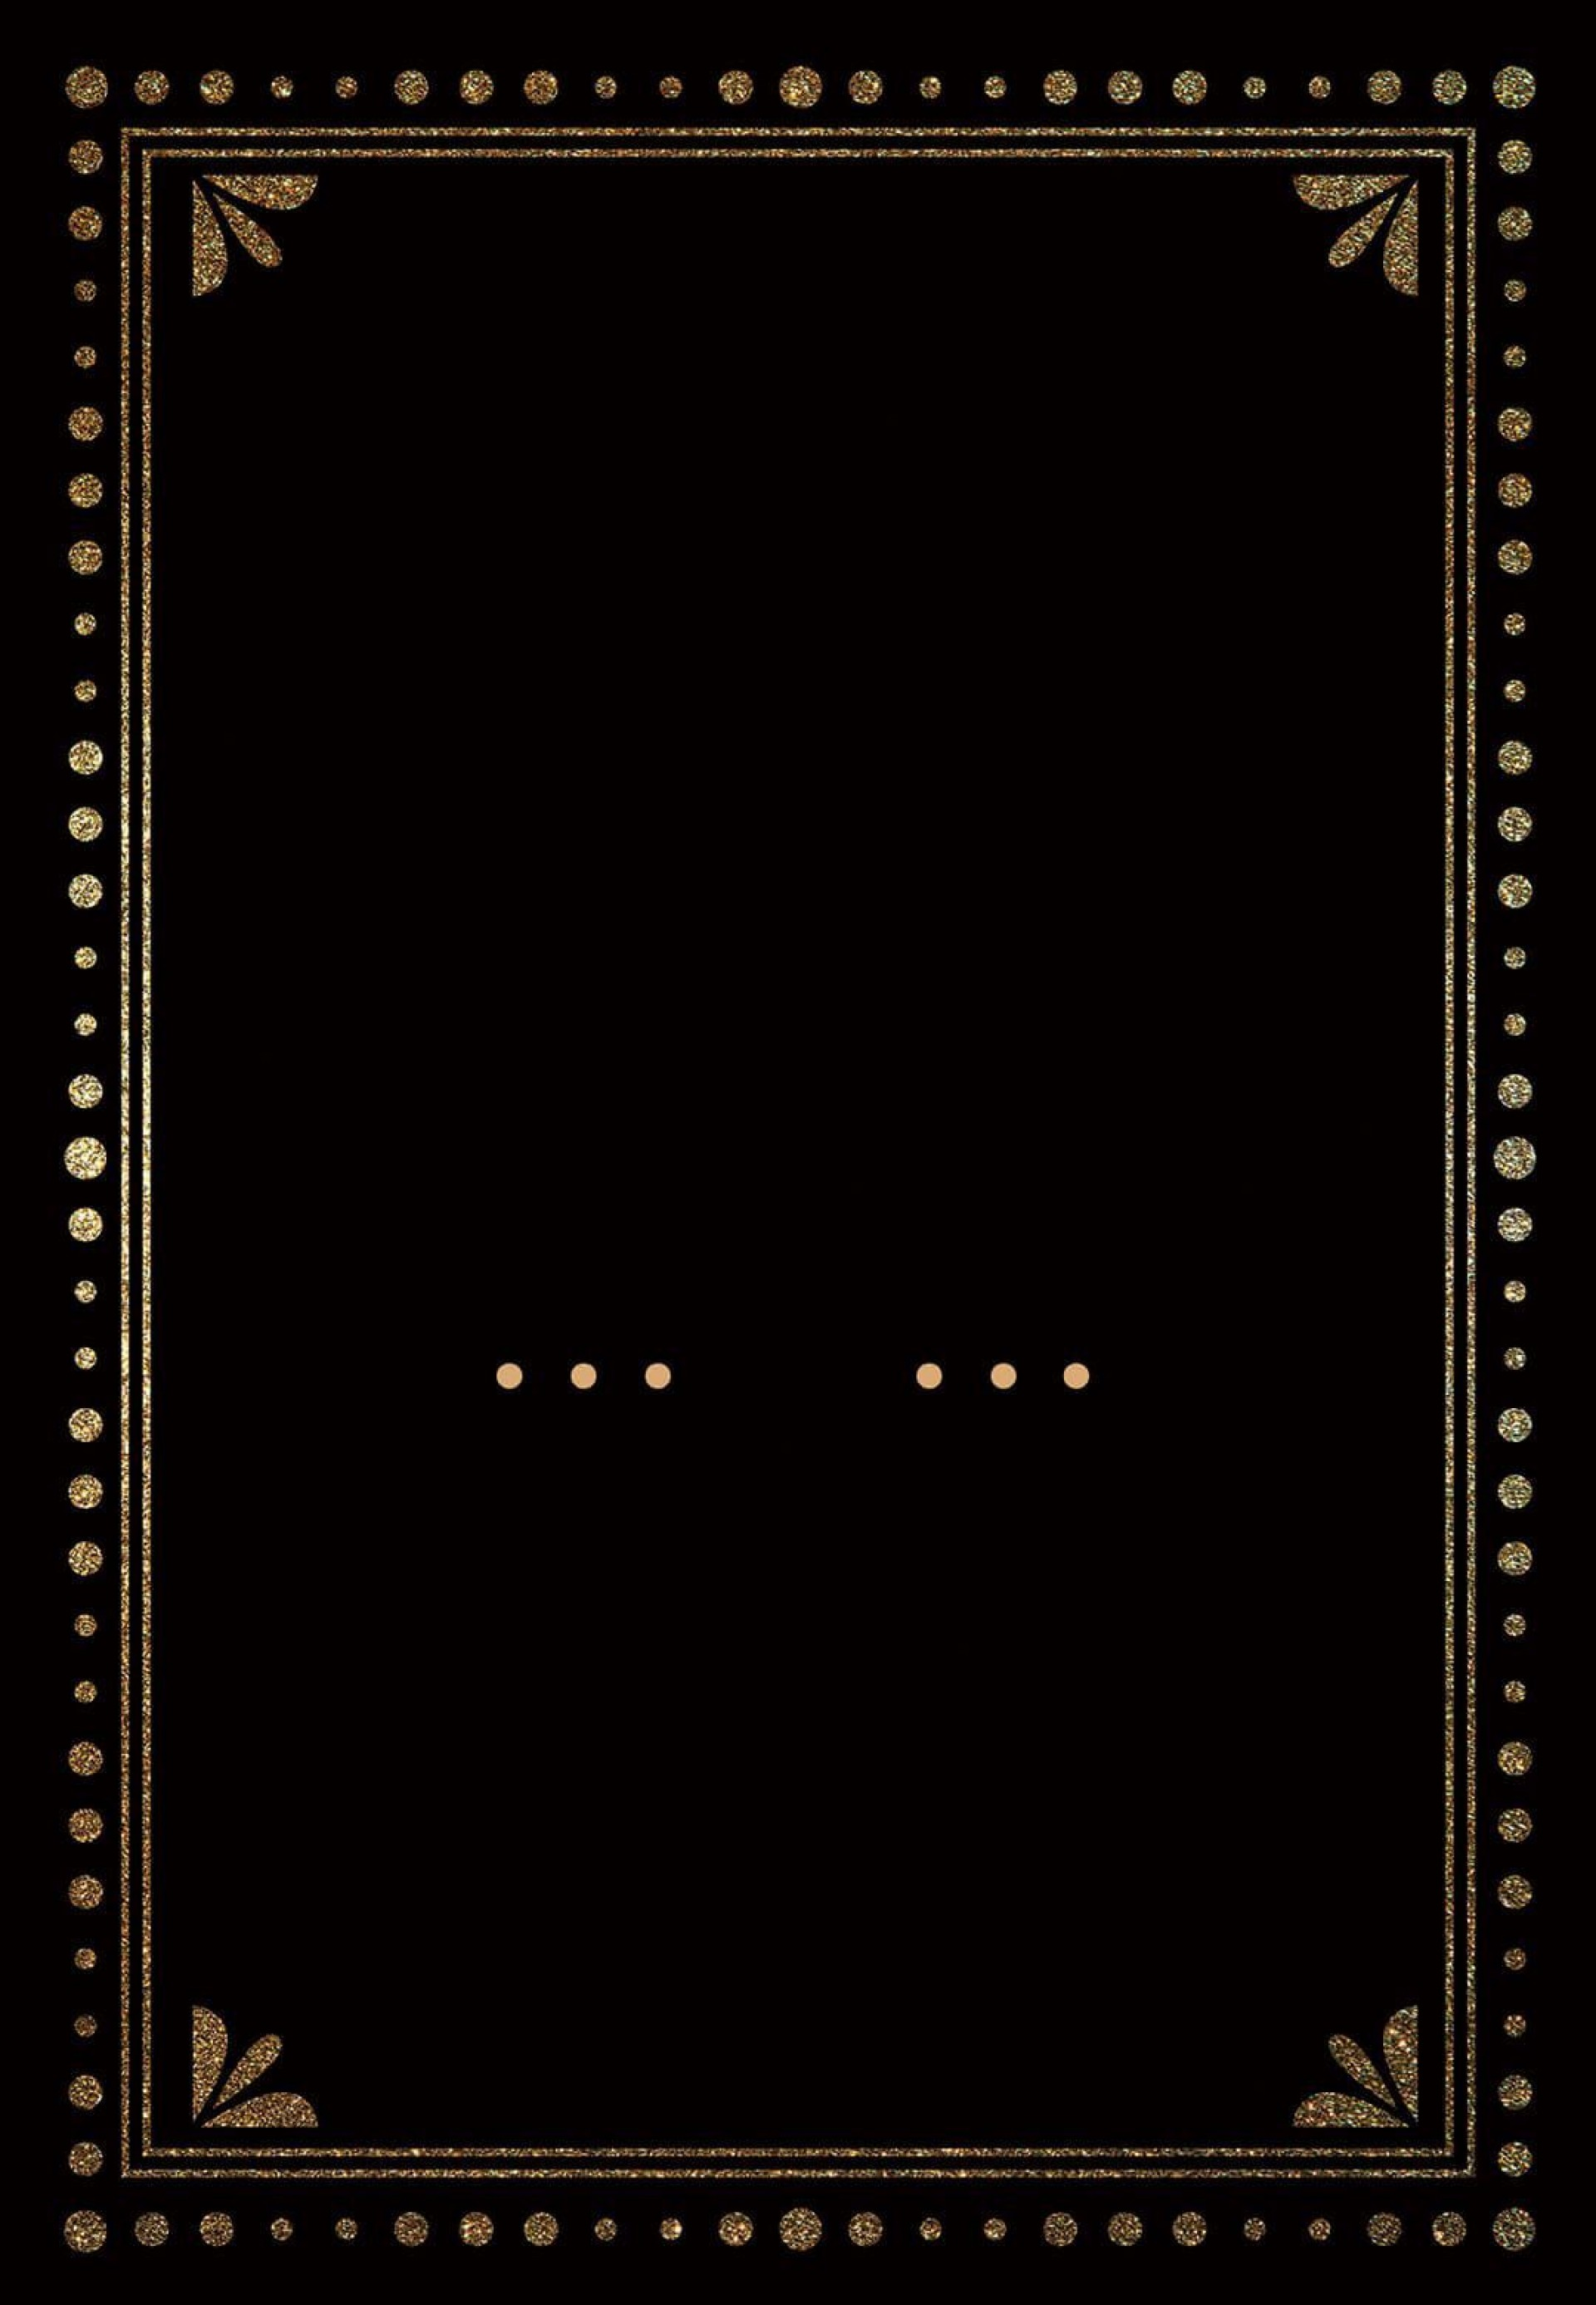 003 Impressive Black And Gold Invitation Template Highest Clarity  Design White Free Printable1920